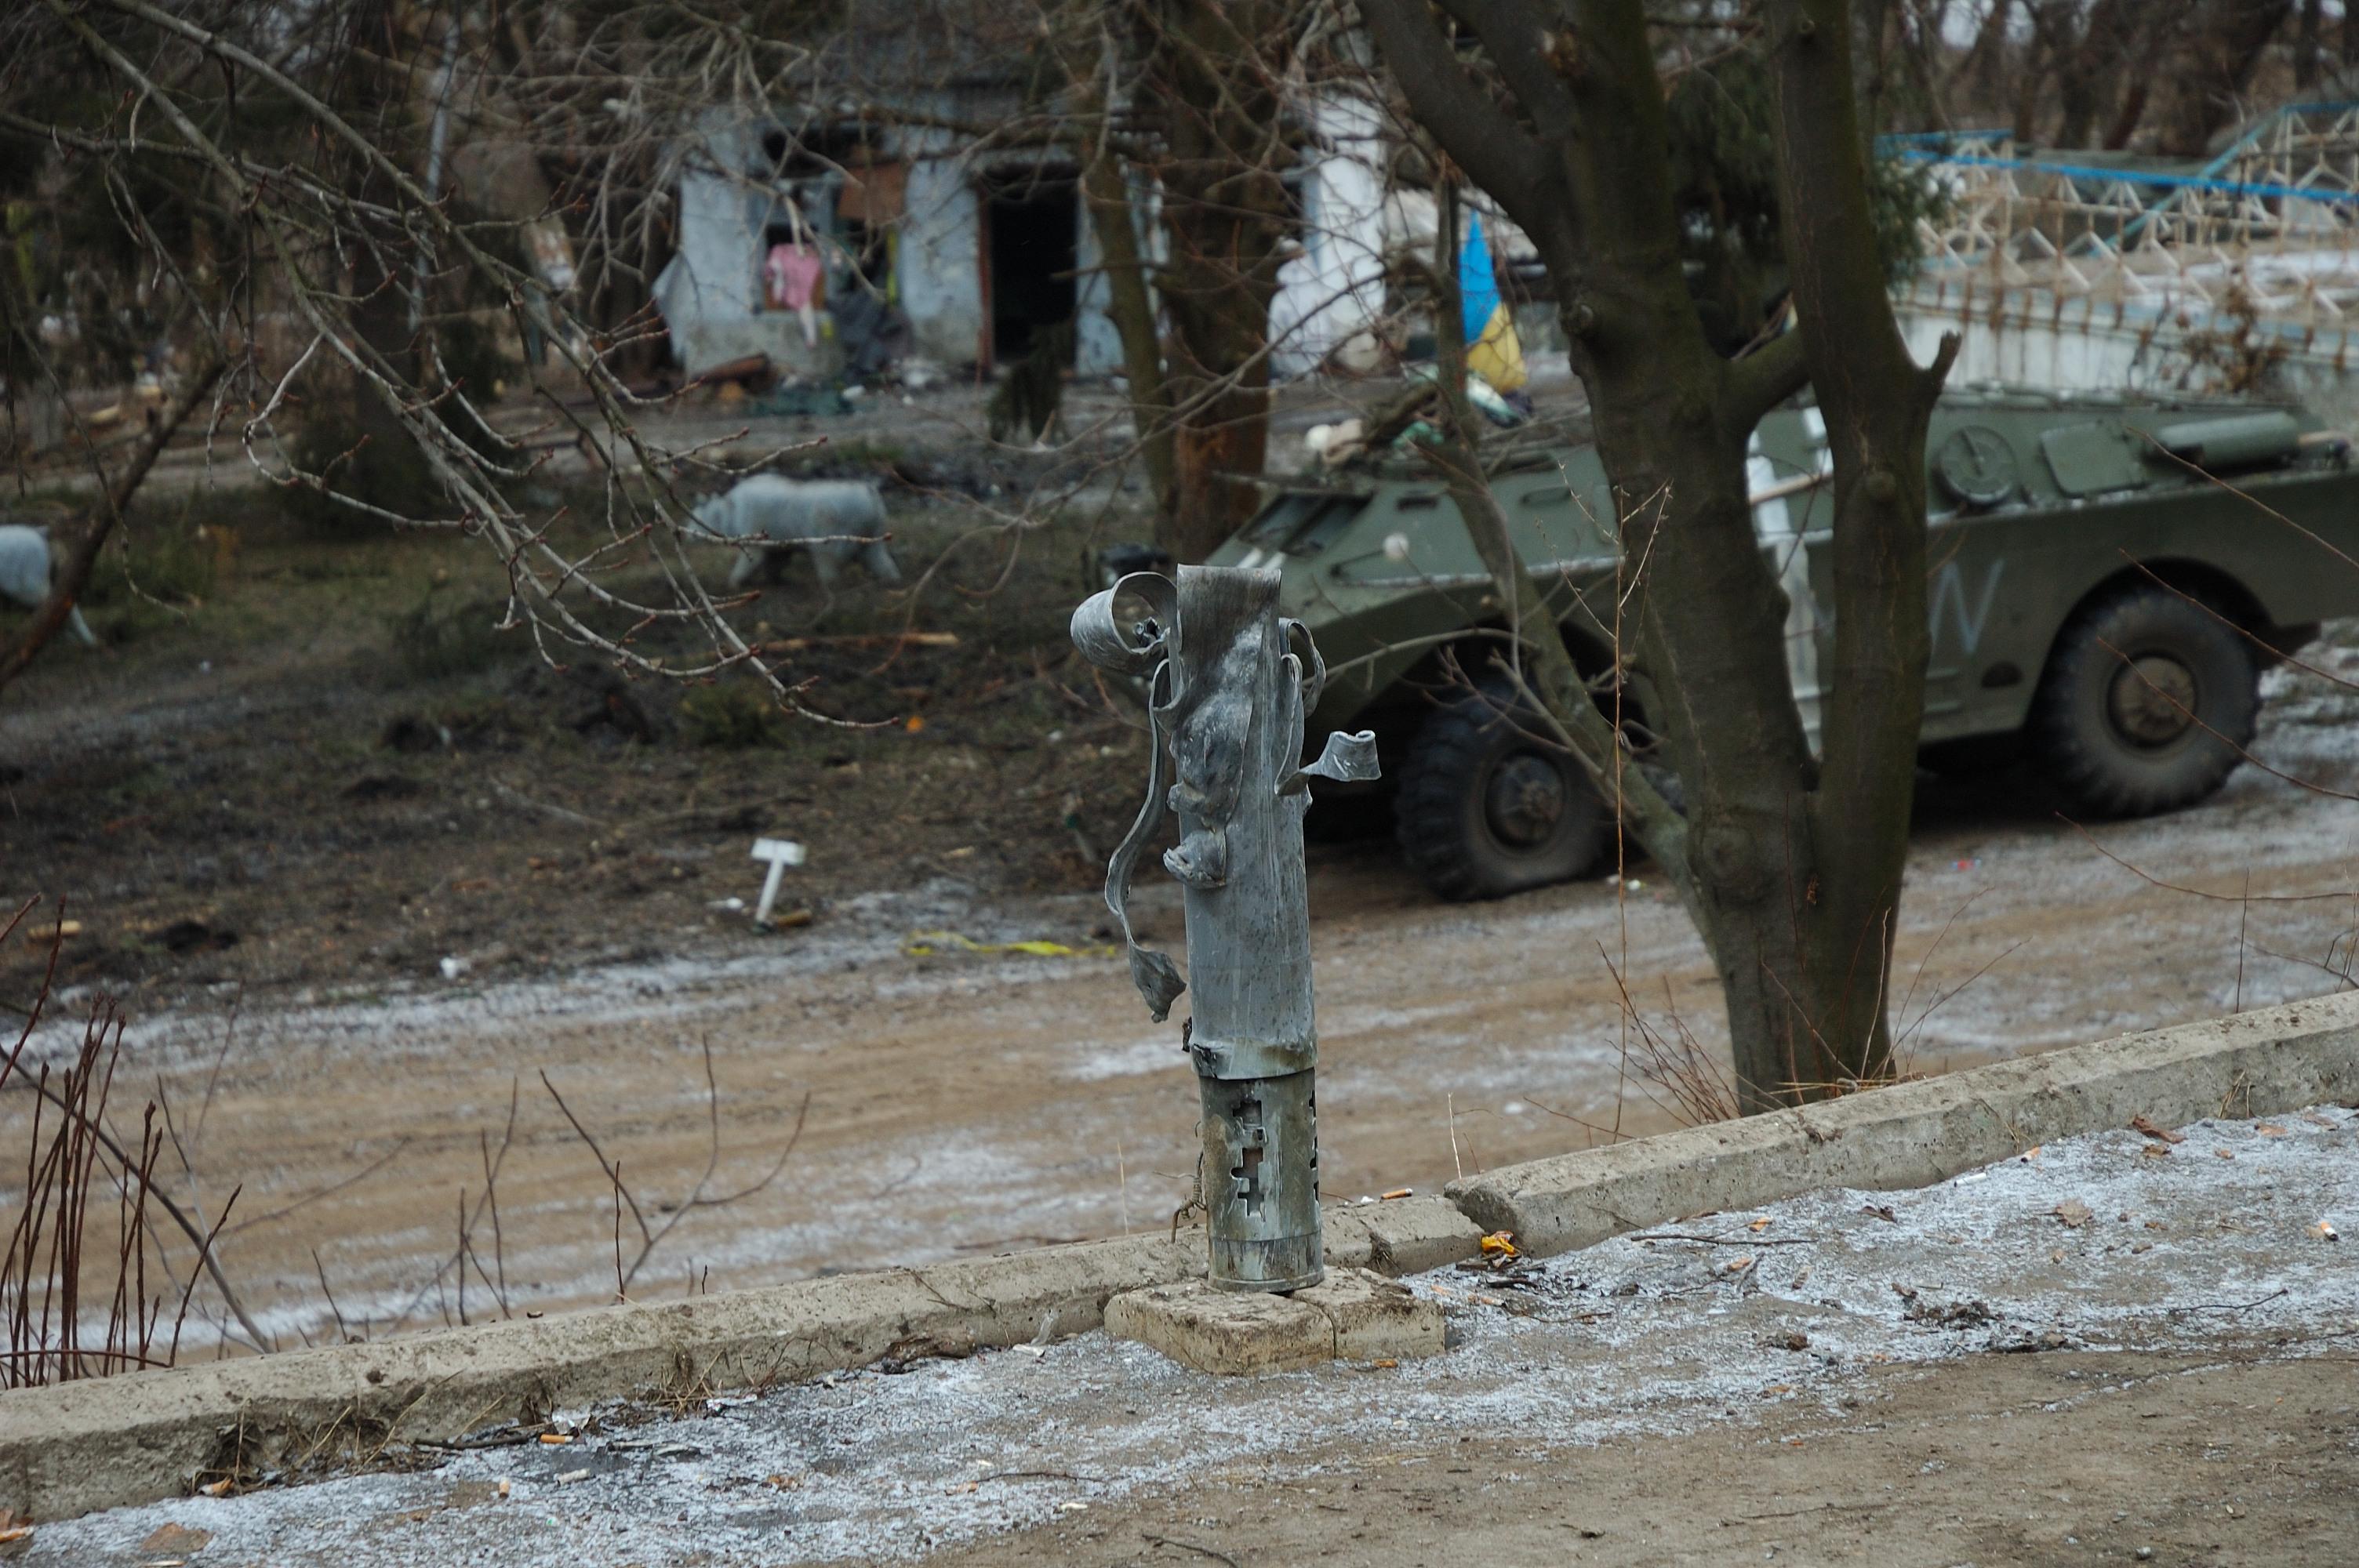 Debaltseve MLRS rocket damage